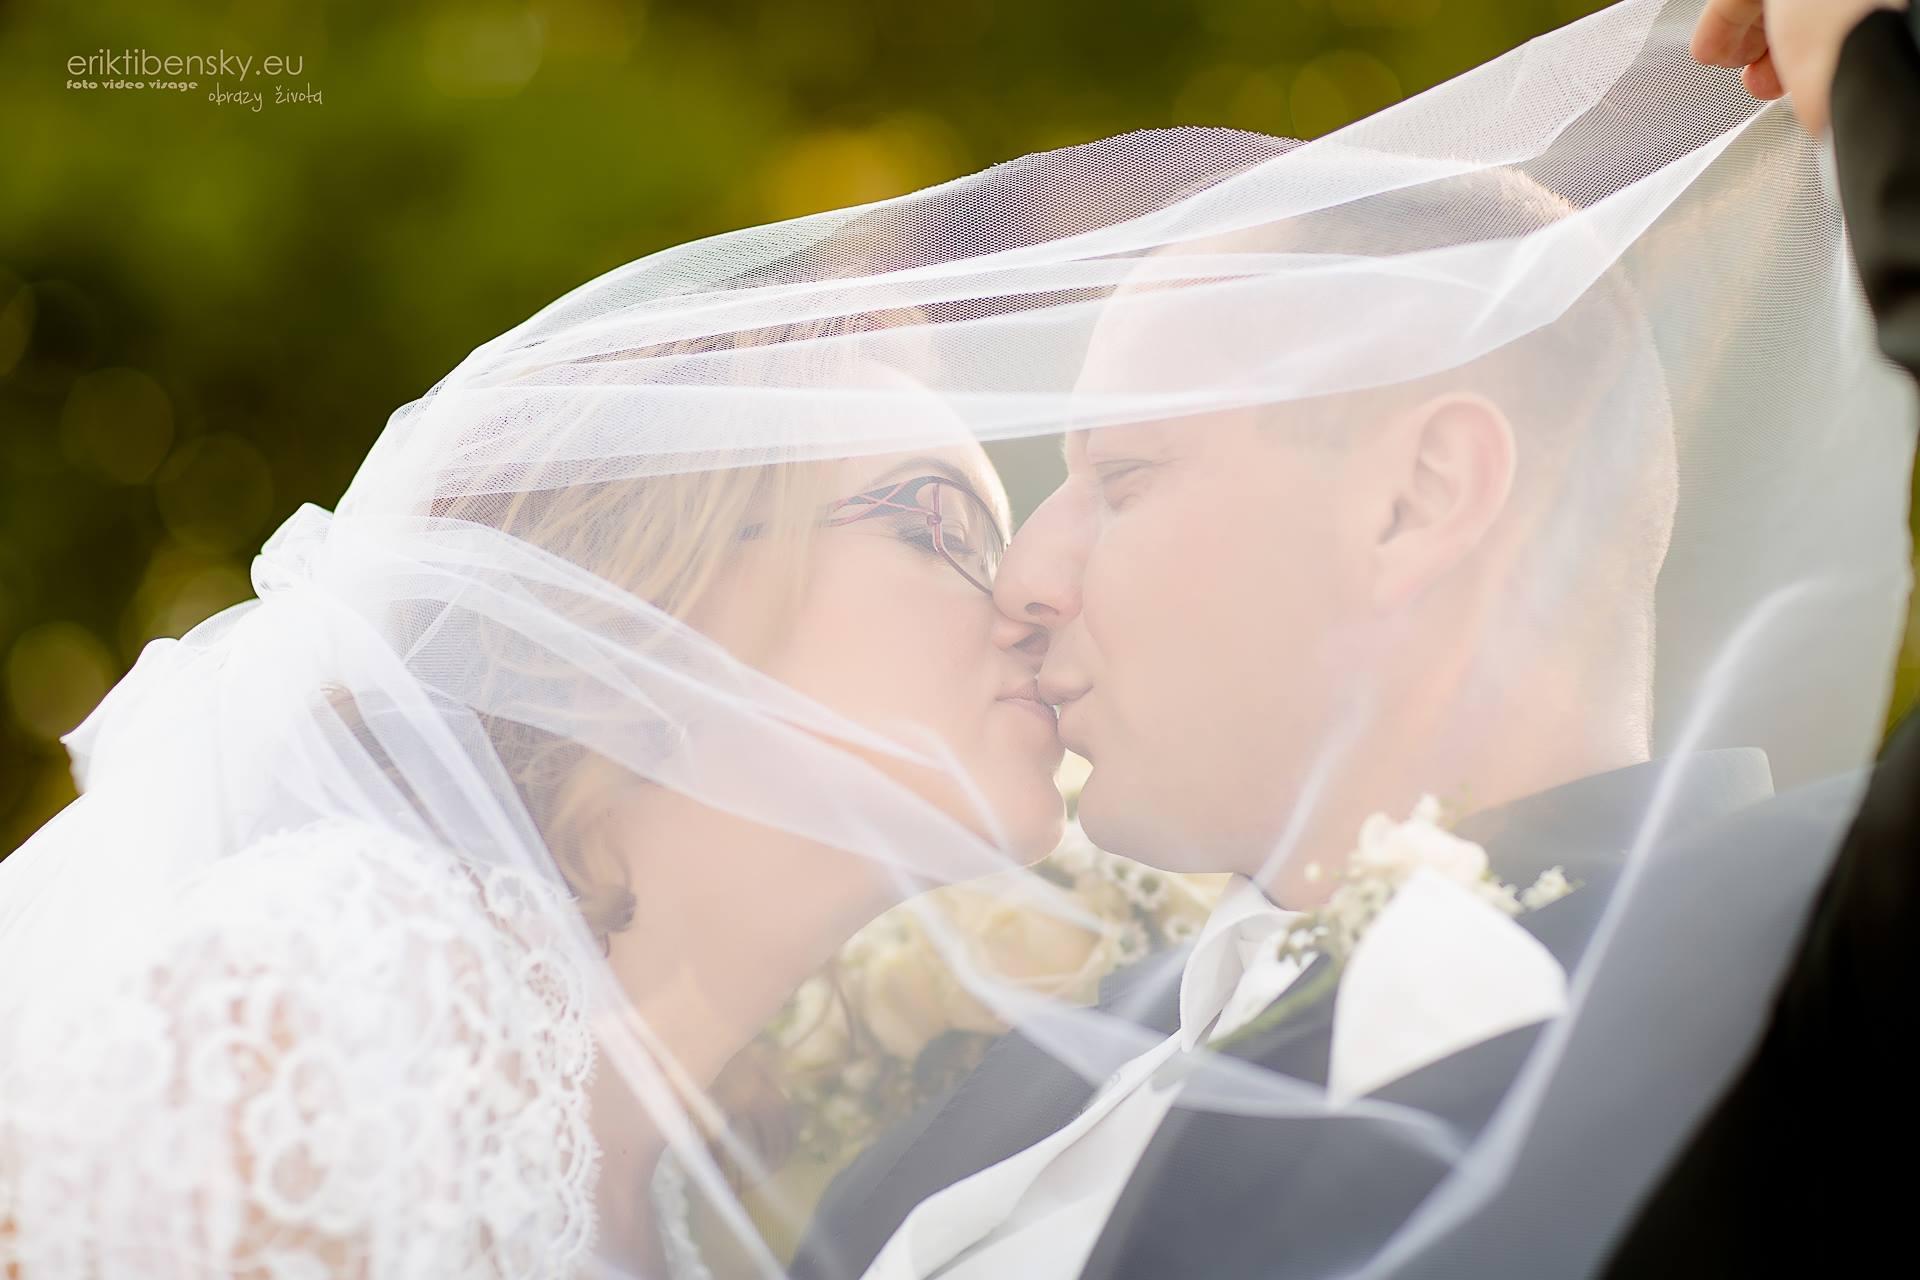 eriktibensky-eu-svadobny-fotograf-wedding-photographer-3035